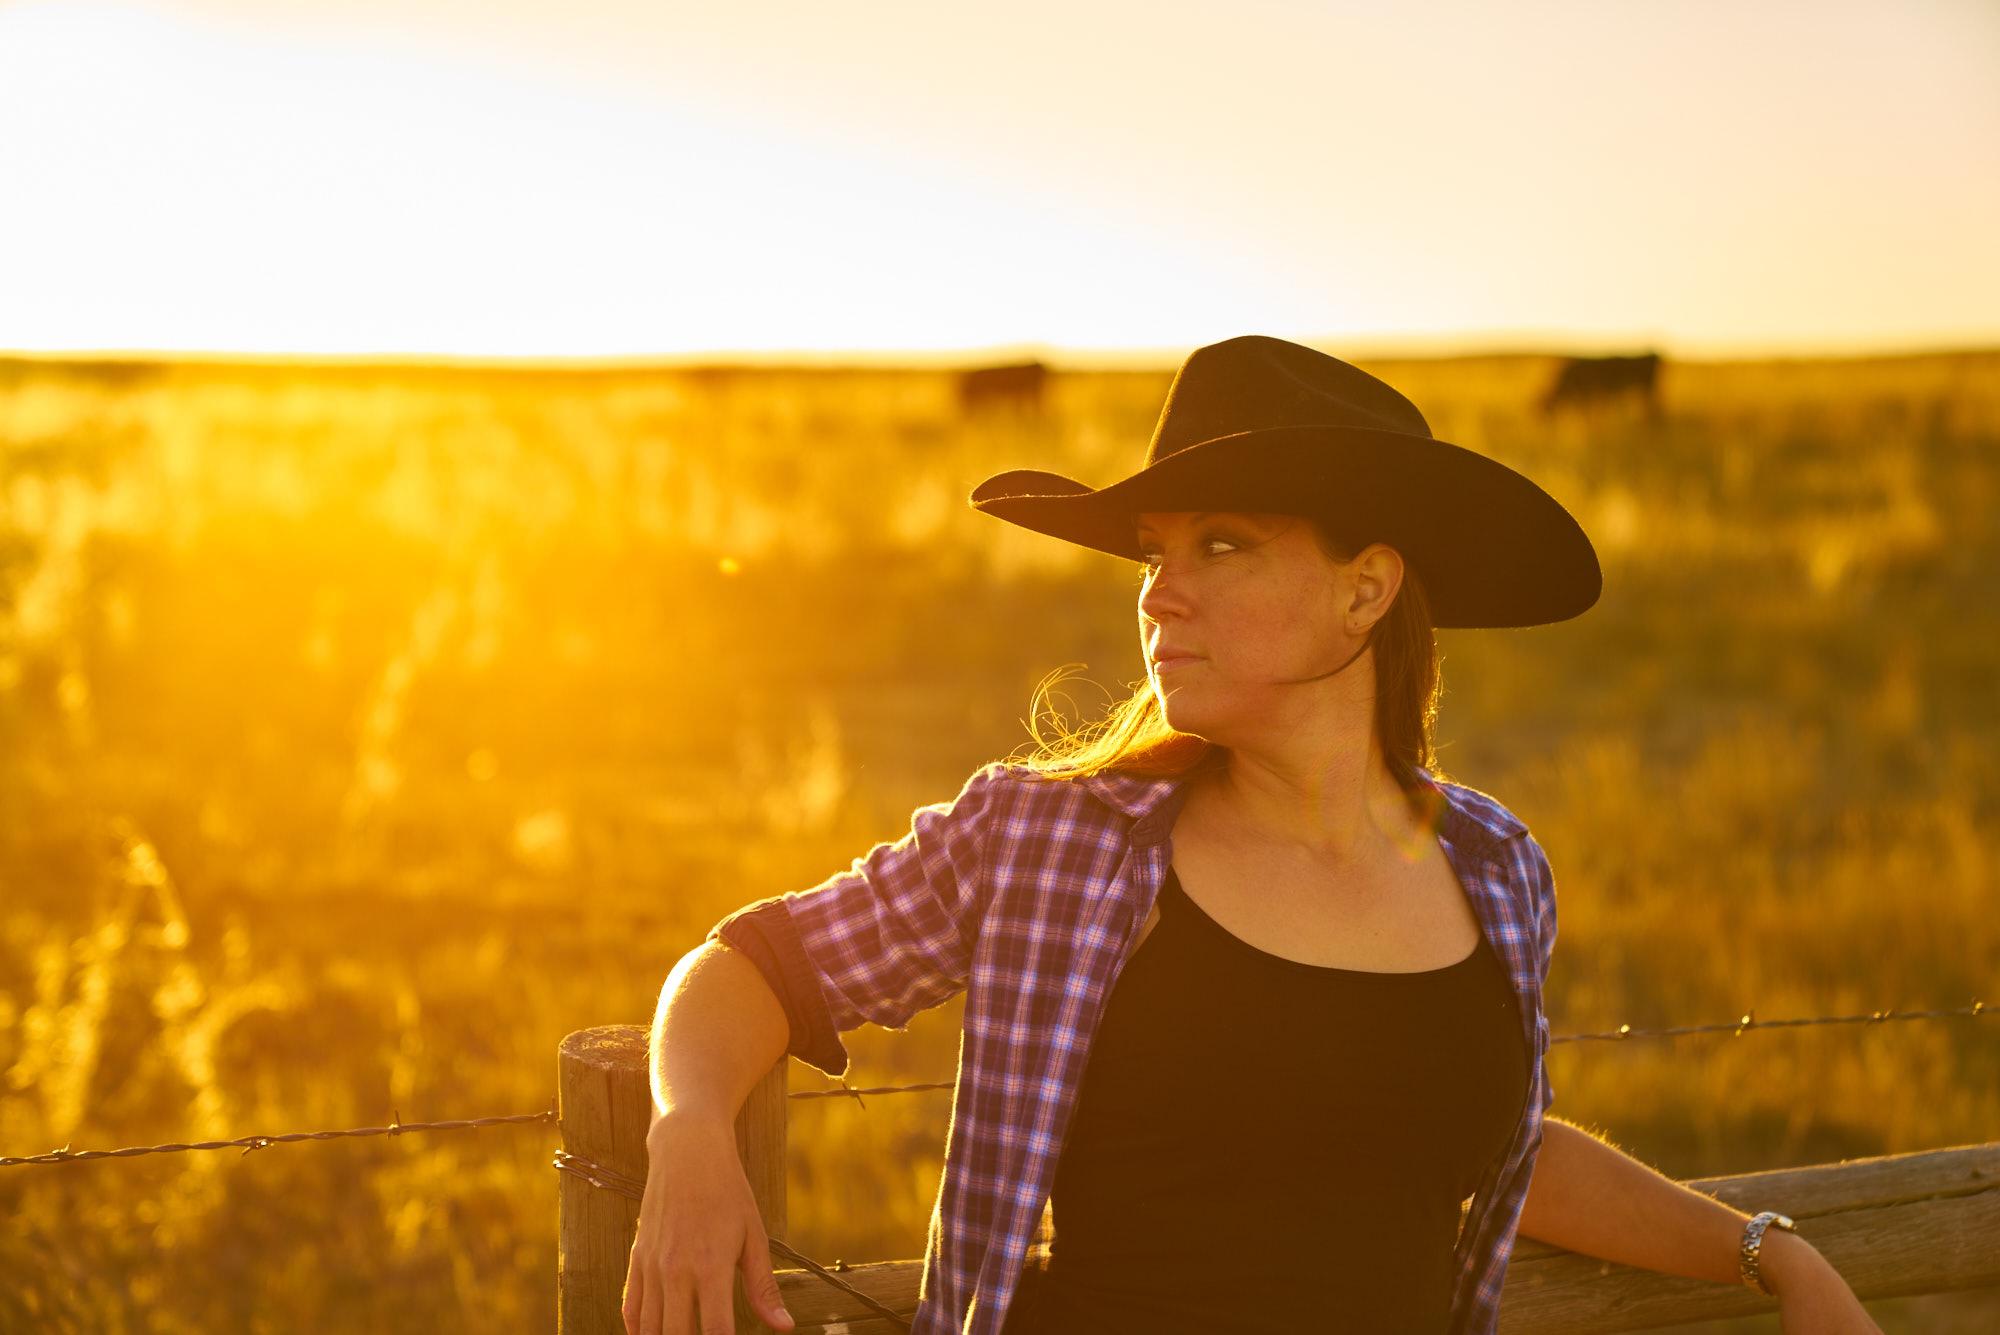 AMVISUALS_Erin_Wyoming_Editorial_DSC1372.jpg